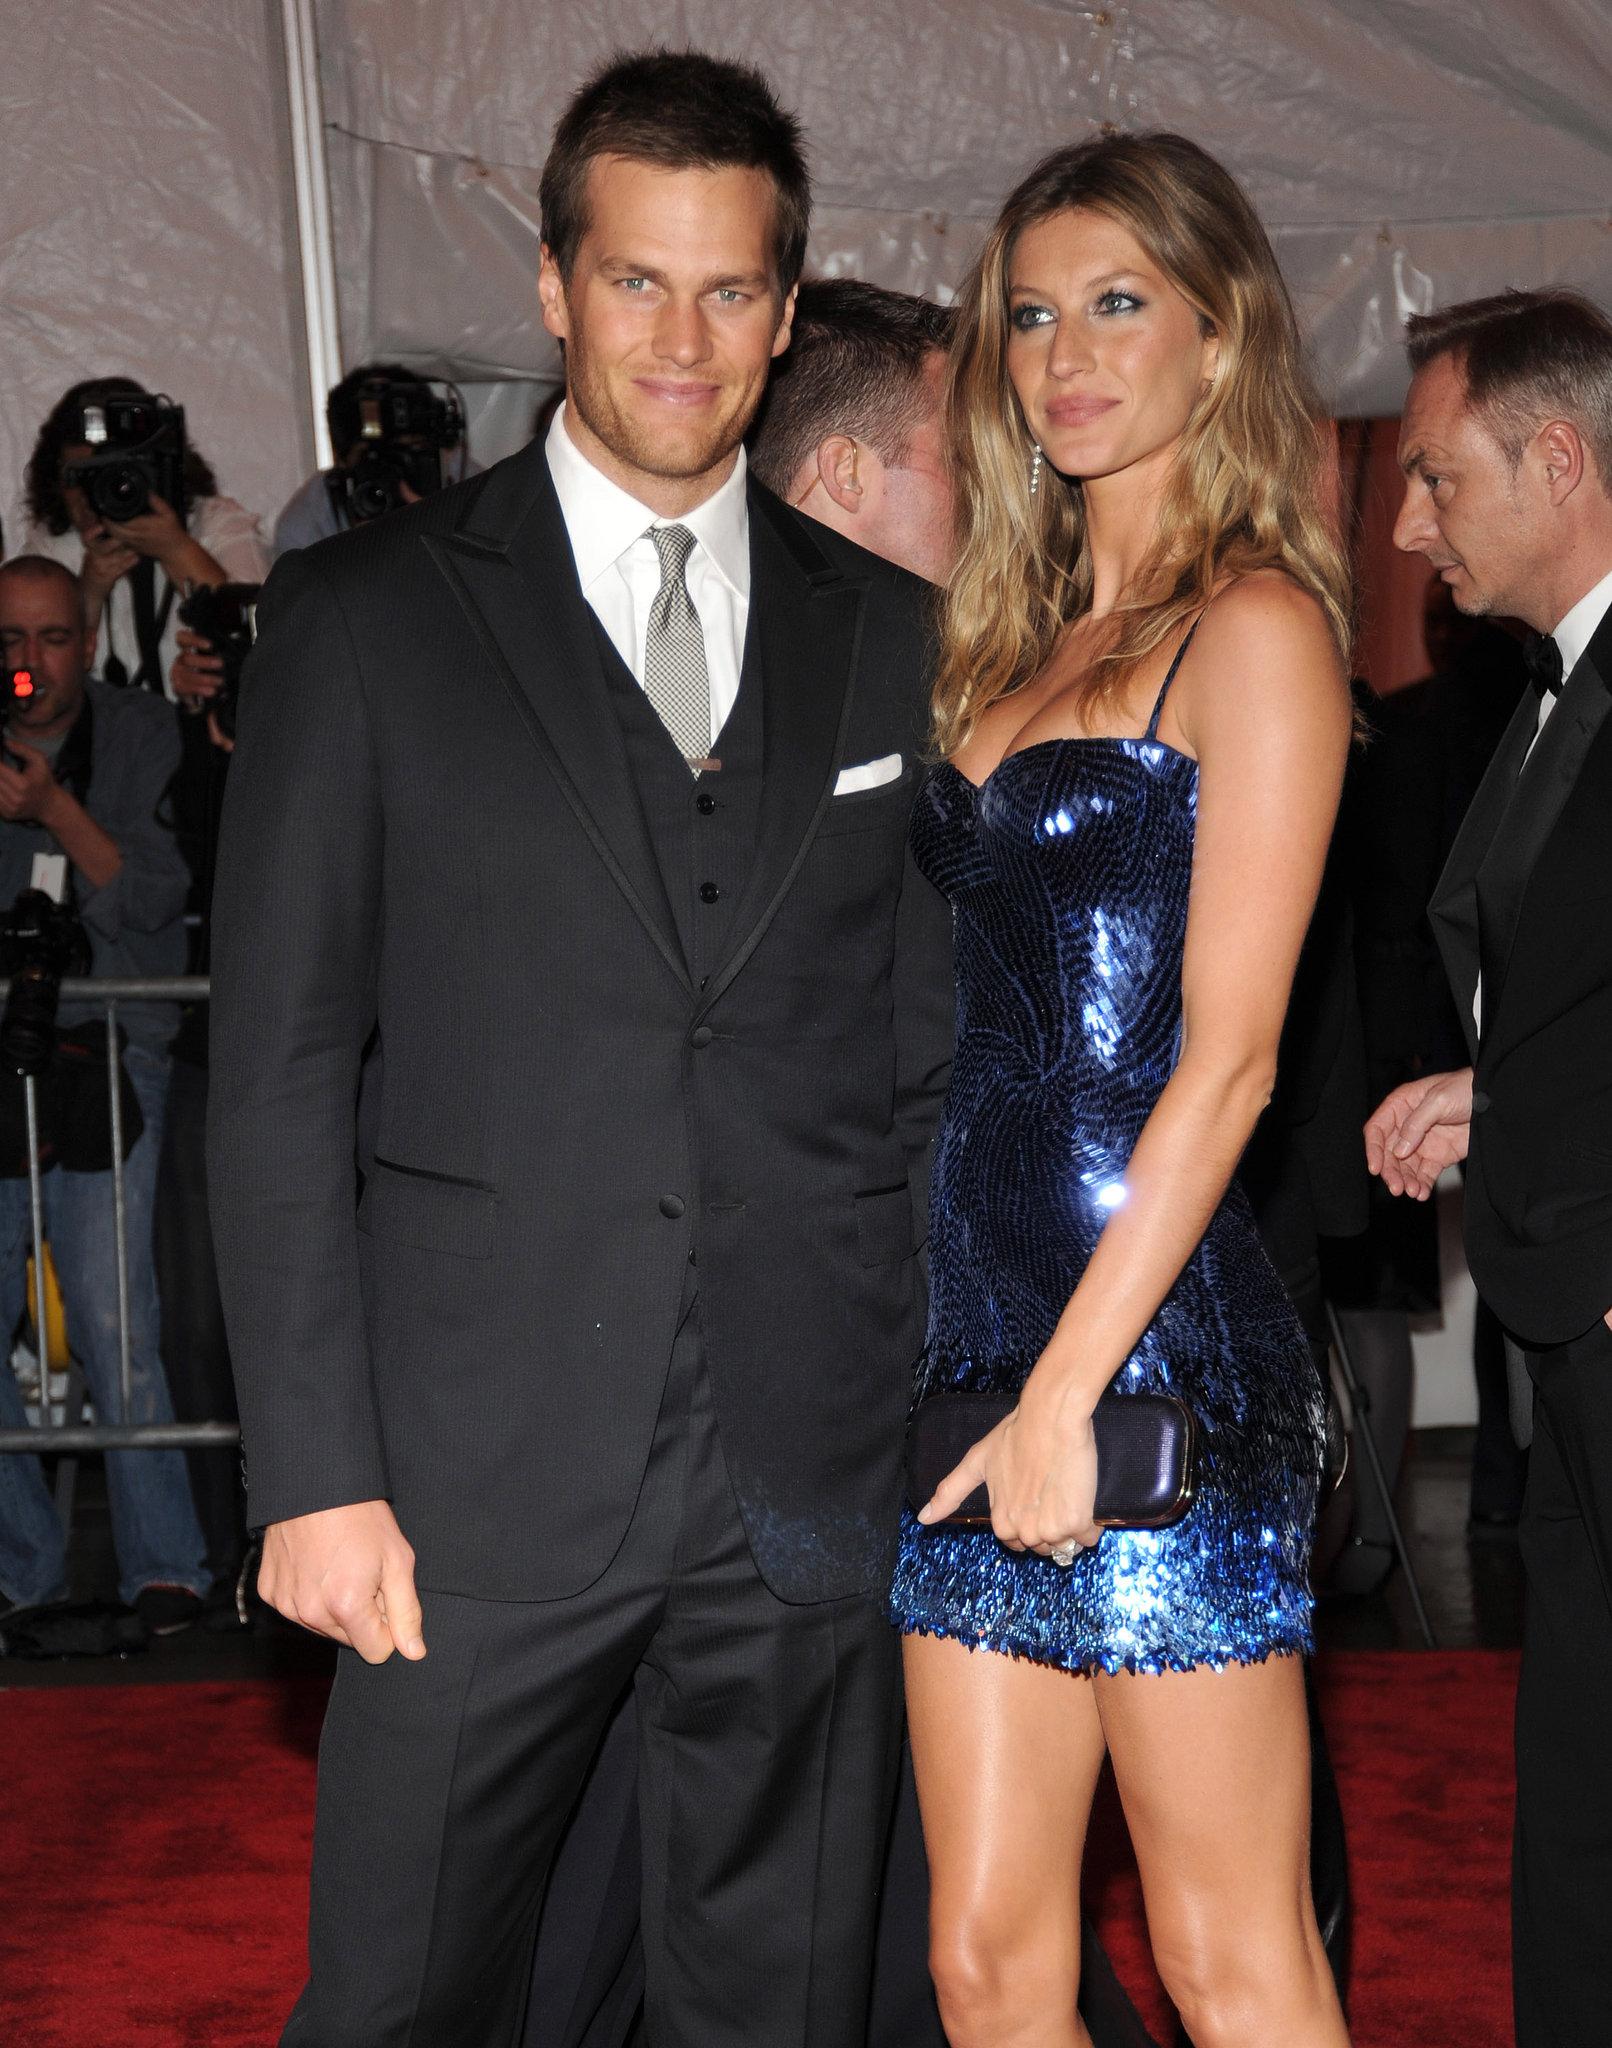 Tom Brady And Gisele Bundchen In 2009 Red Carpet Rewind